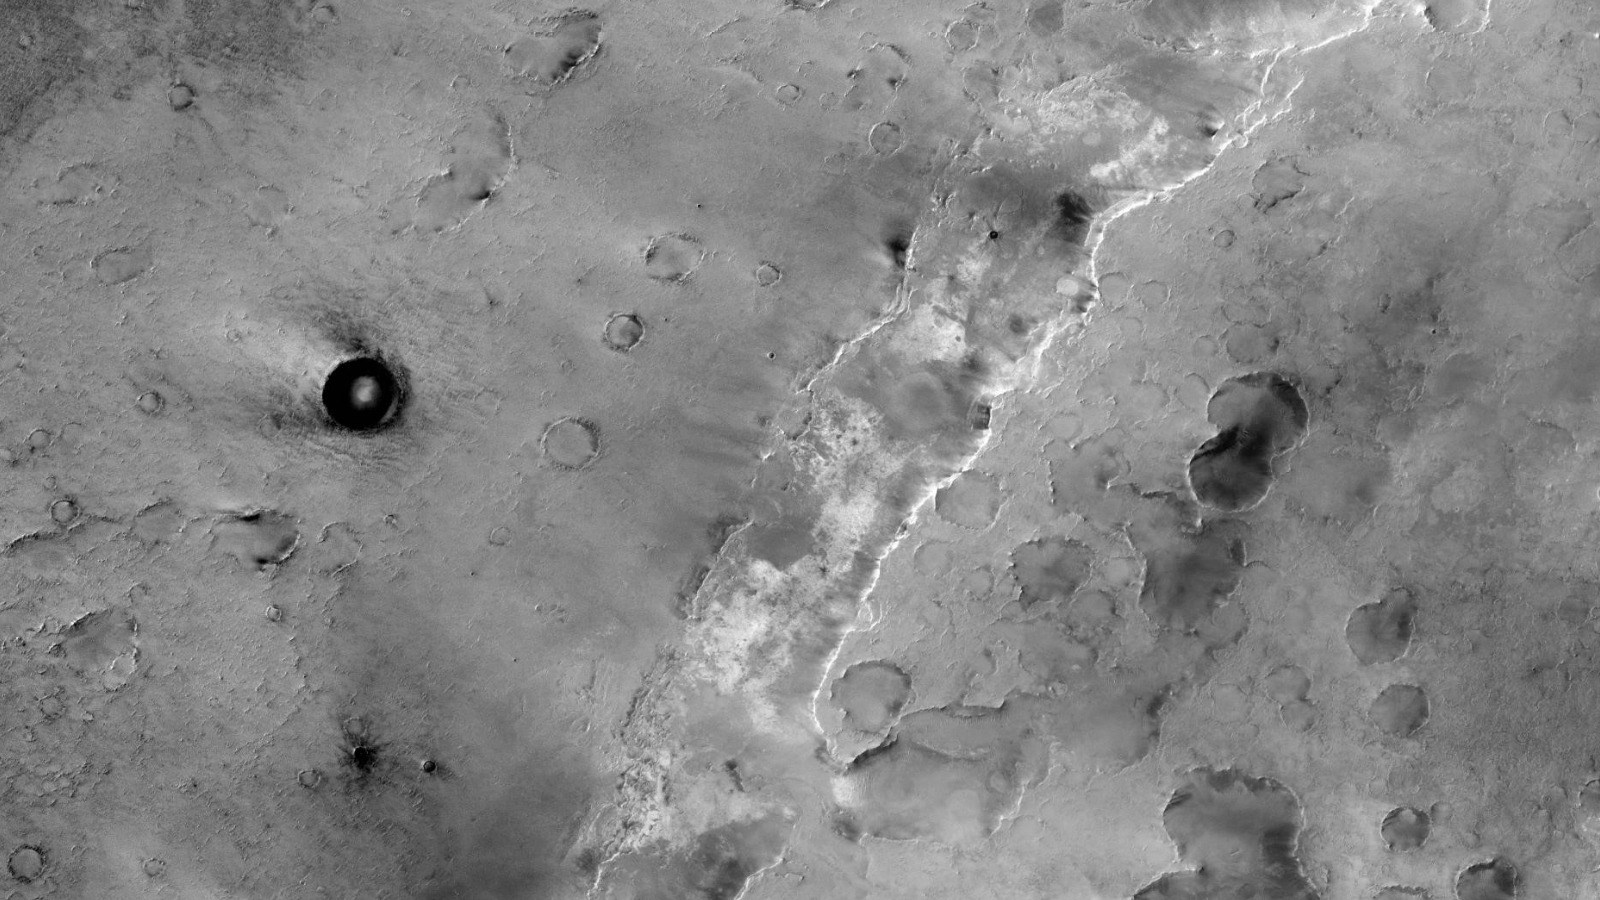 Self-illuminating sphere in Martian crater – Mars Anomalies